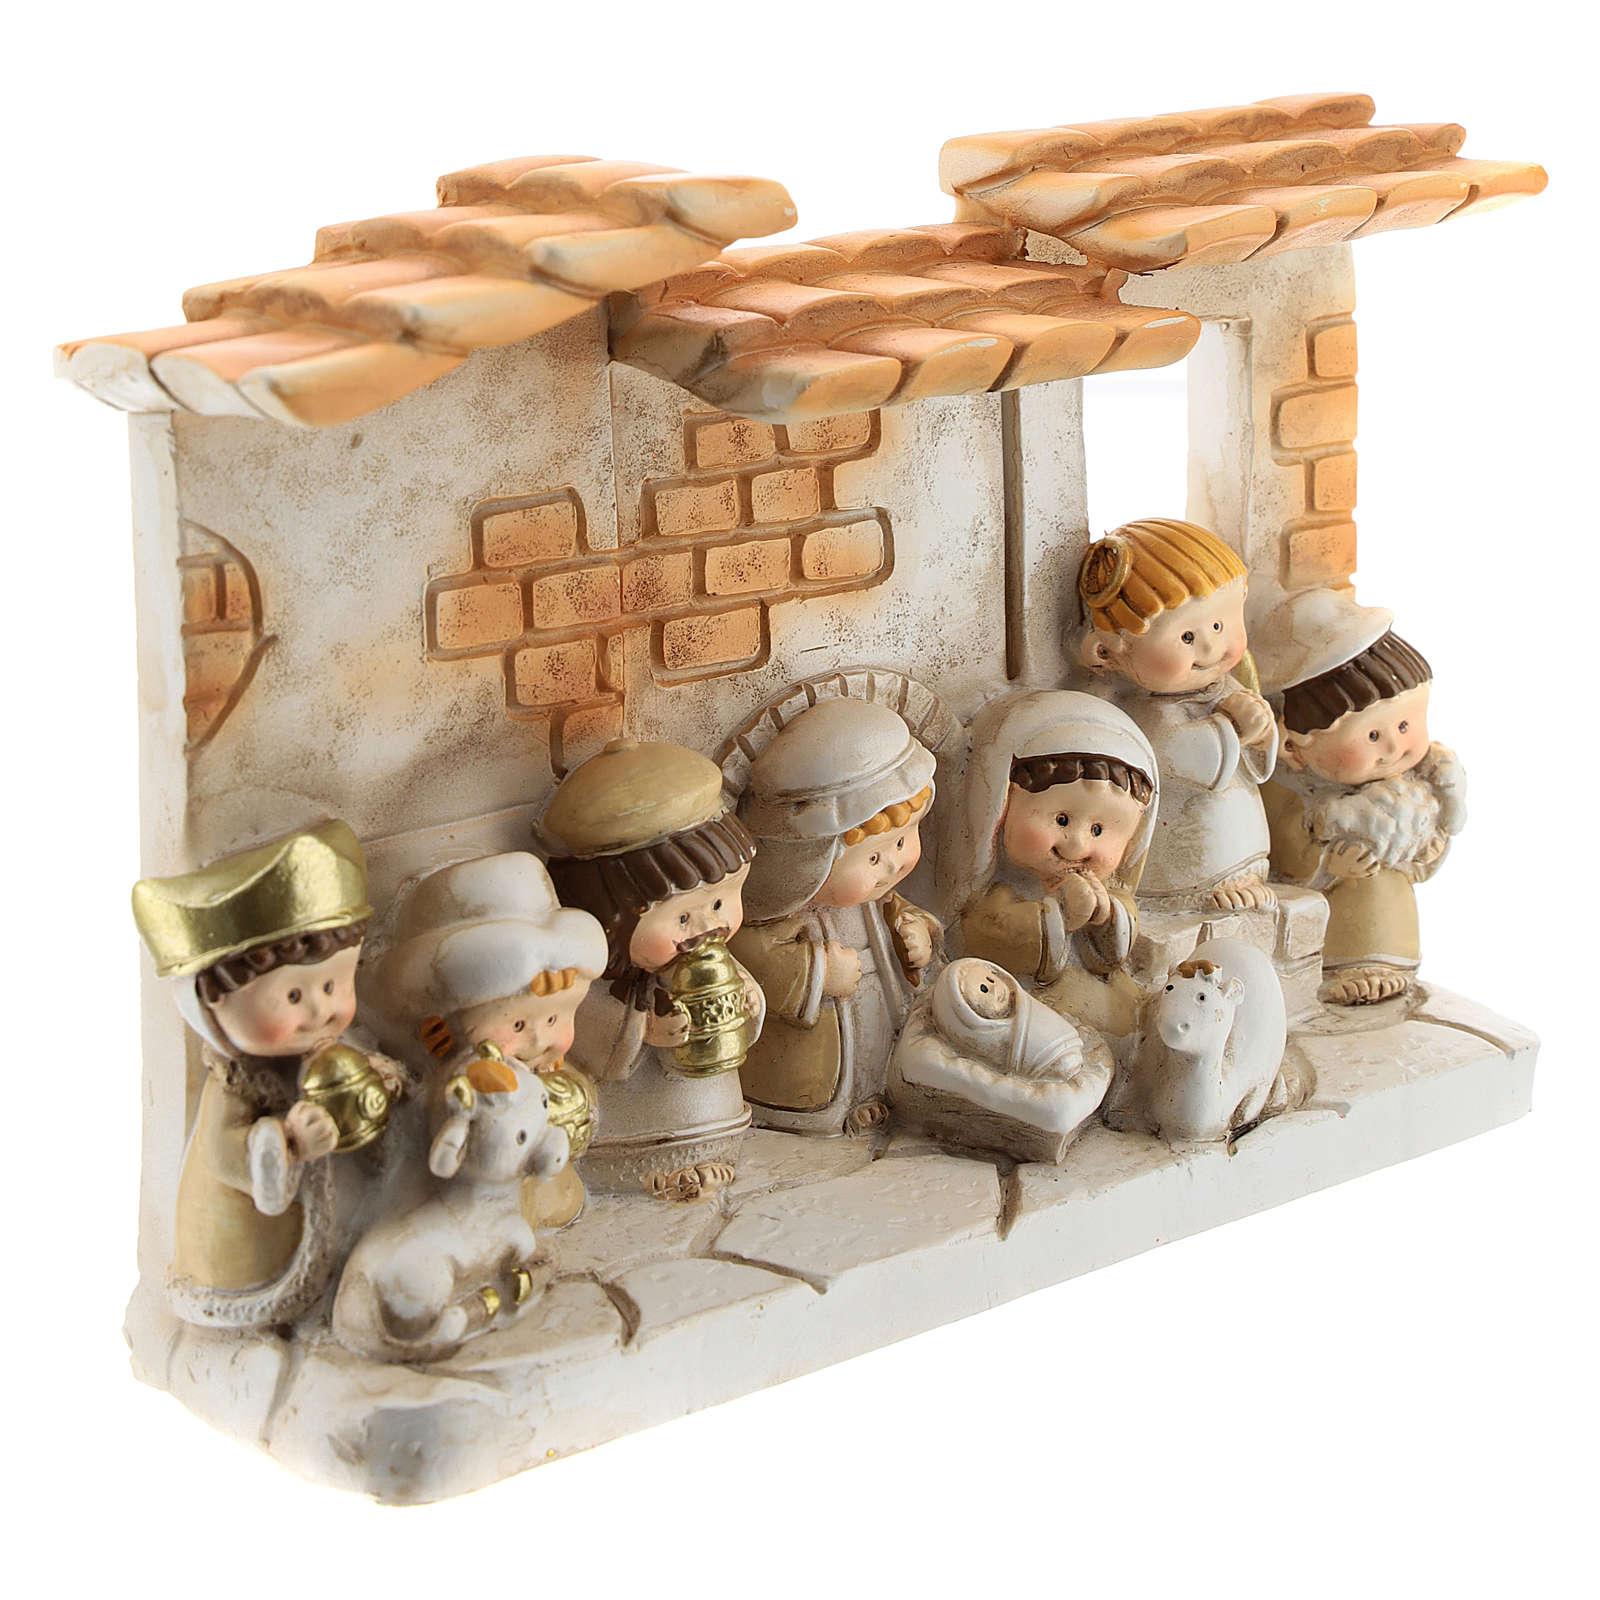 Belén caserío resina 10 personajes 15x10 cm línea niños 4